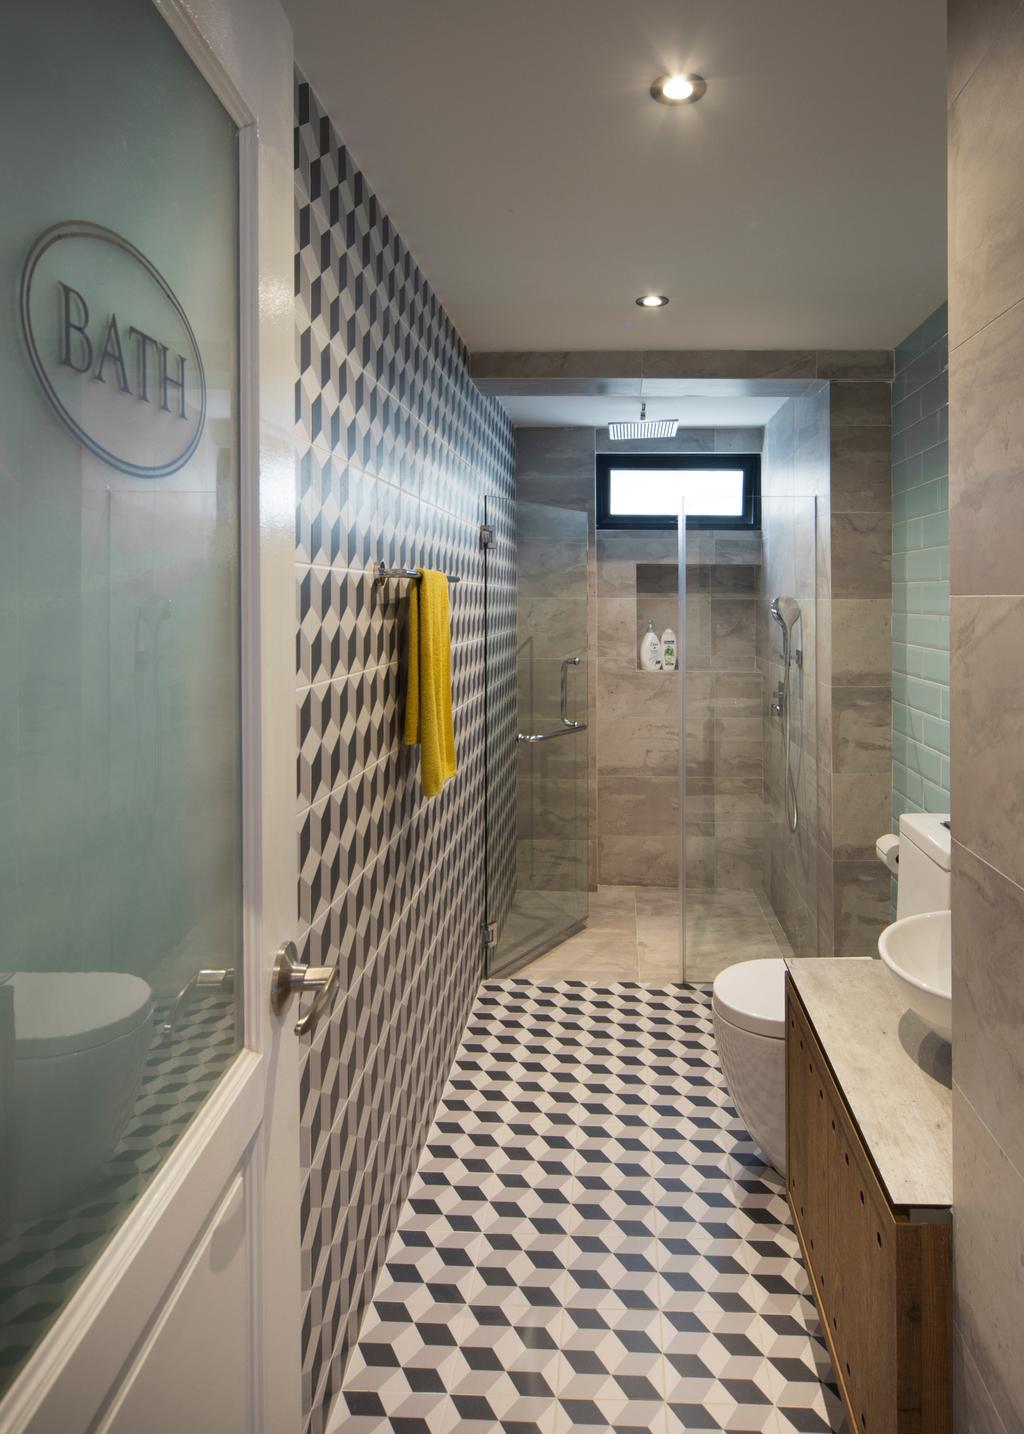 Retro, Condo, Bathroom, Bukit View, Interior Designer, The Scientist, Geometric Tiles, Patterned Tiles, Patterned Wall, Towel Rack, Shower Screen, Big Tiles, Toilet